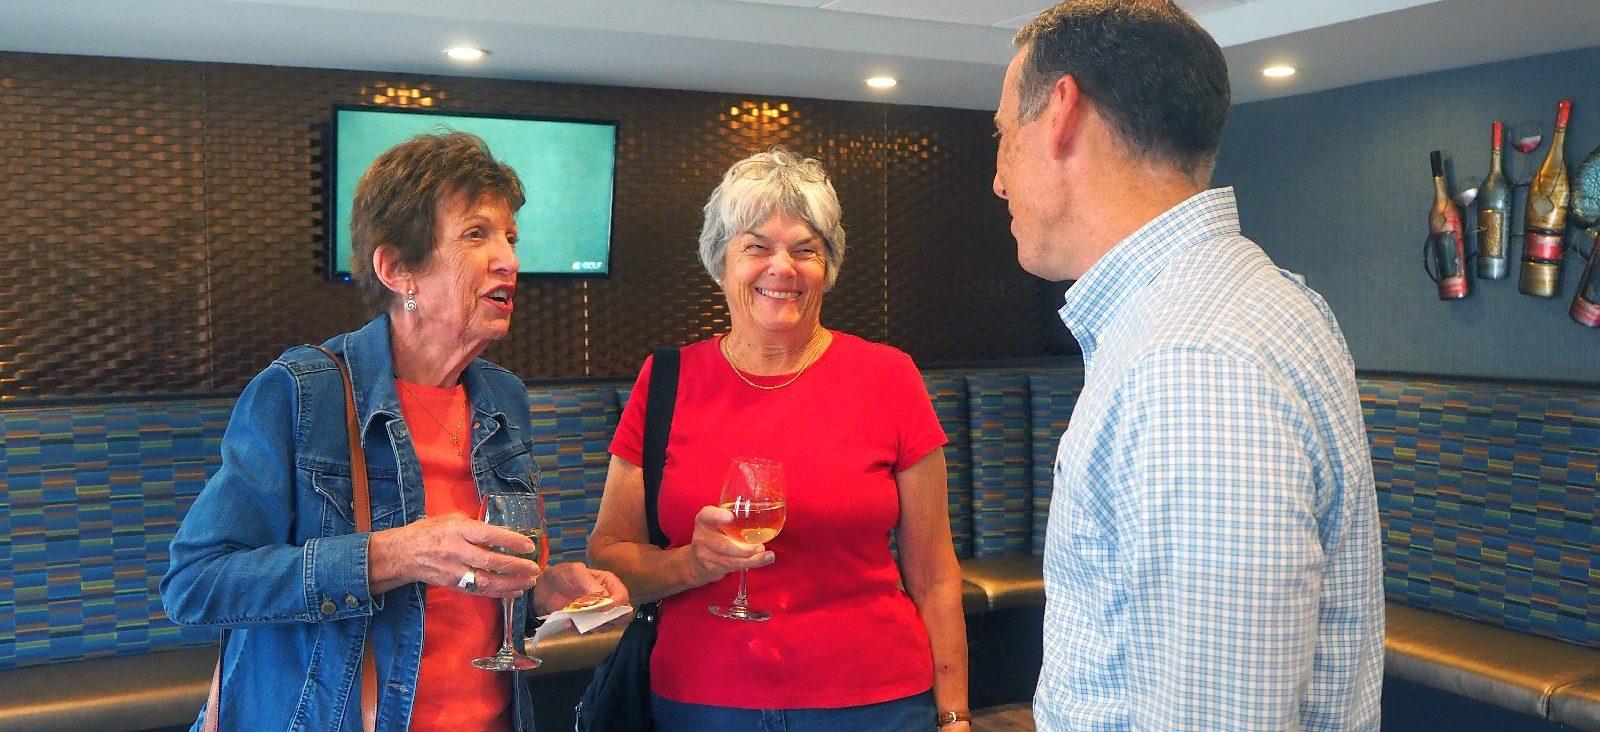 Residents speak with Jon Renegar